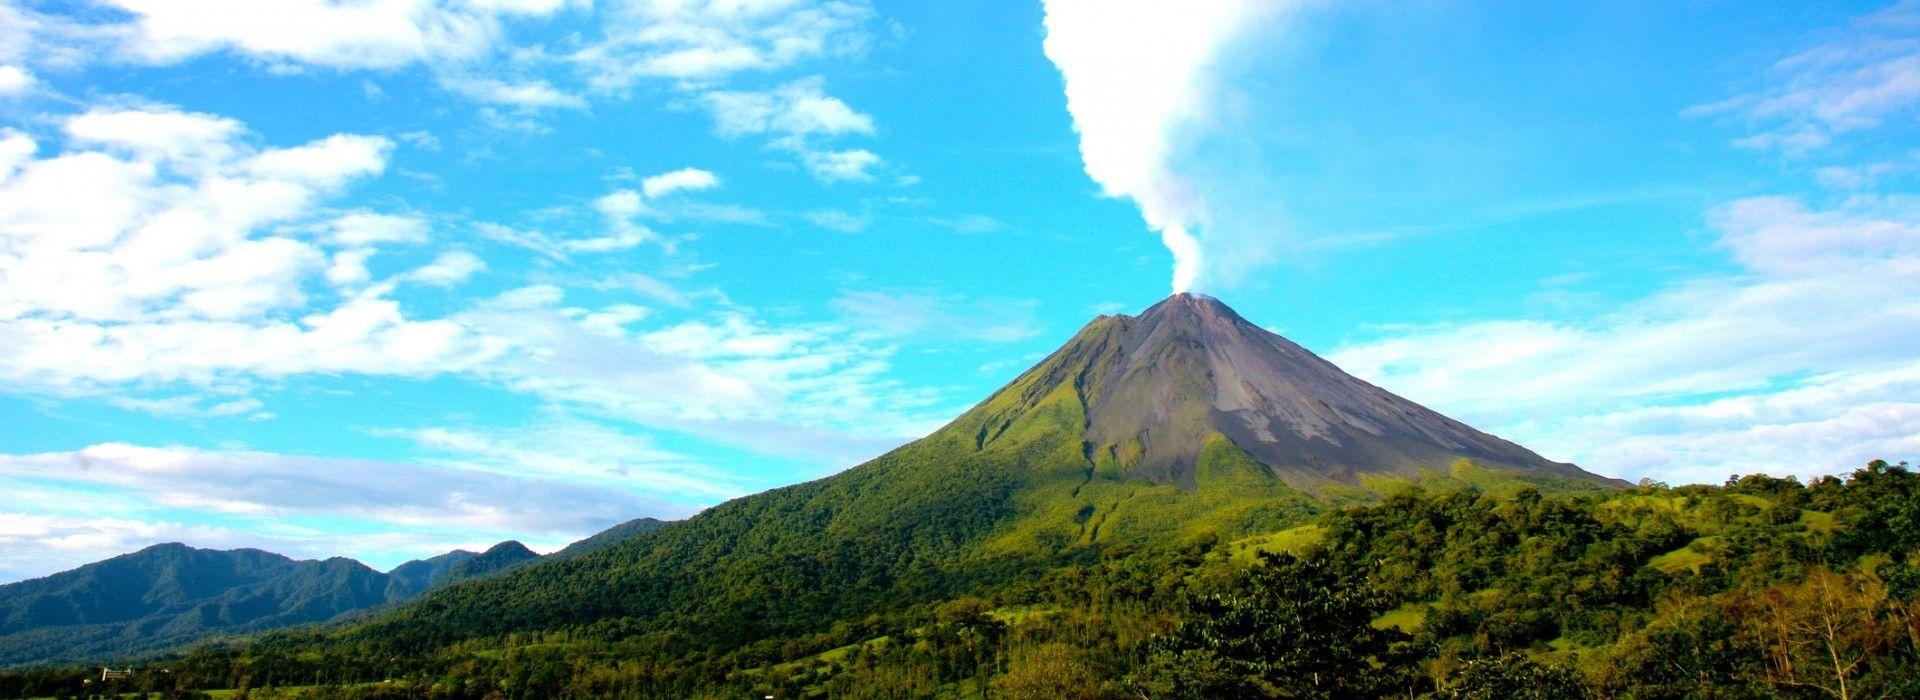 Rincon de la Vieja Volcano National Park Tours